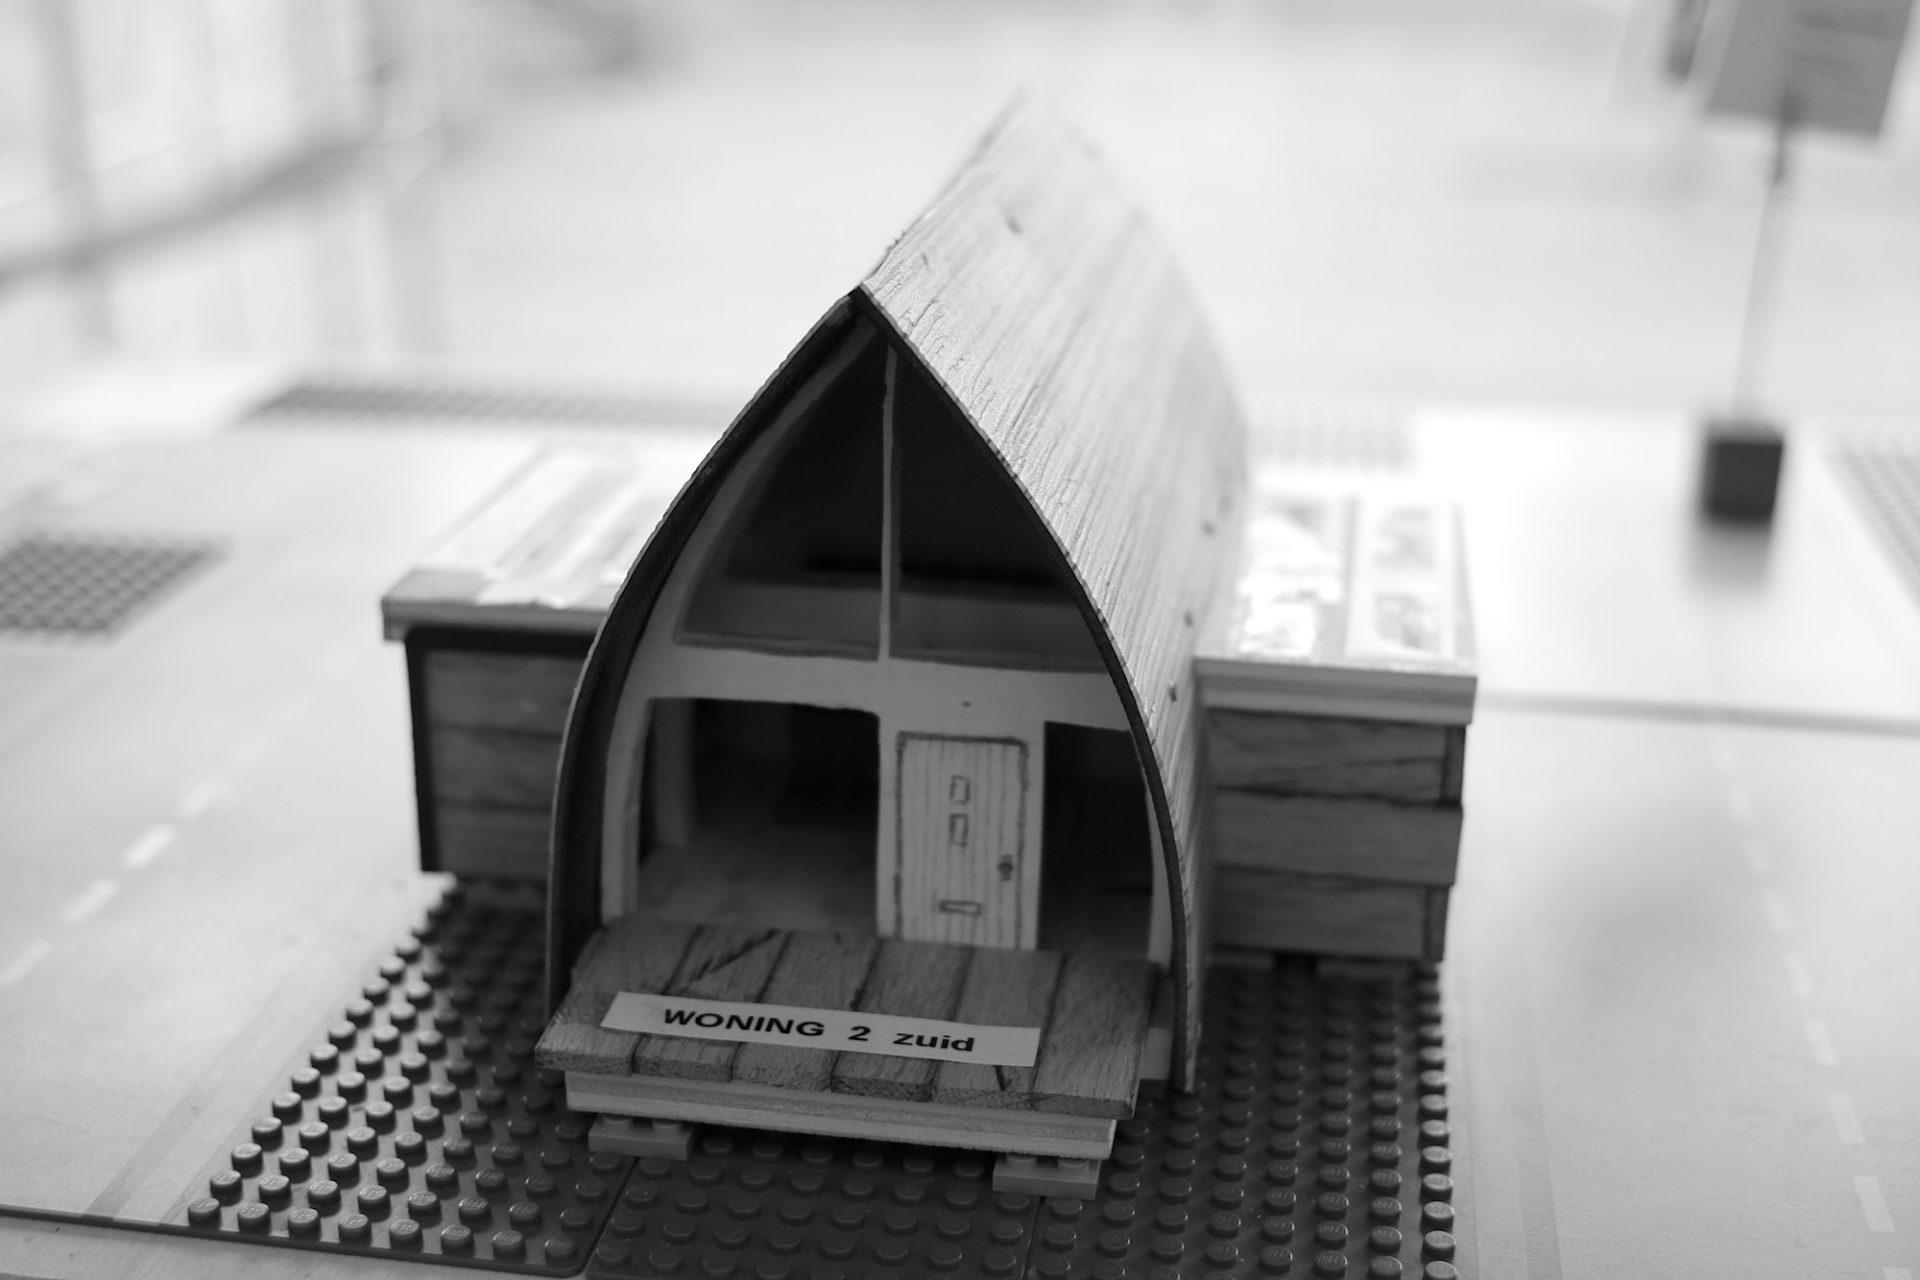 """Living Free. Your Tiny House Almere"".  Ob Profis, Laien, Architekten oder begabte Do-it-Yourself-Bastler: jede/r konnte sich bewerben bei  ""Tiny Housing BouwEXPO"" bewerben."